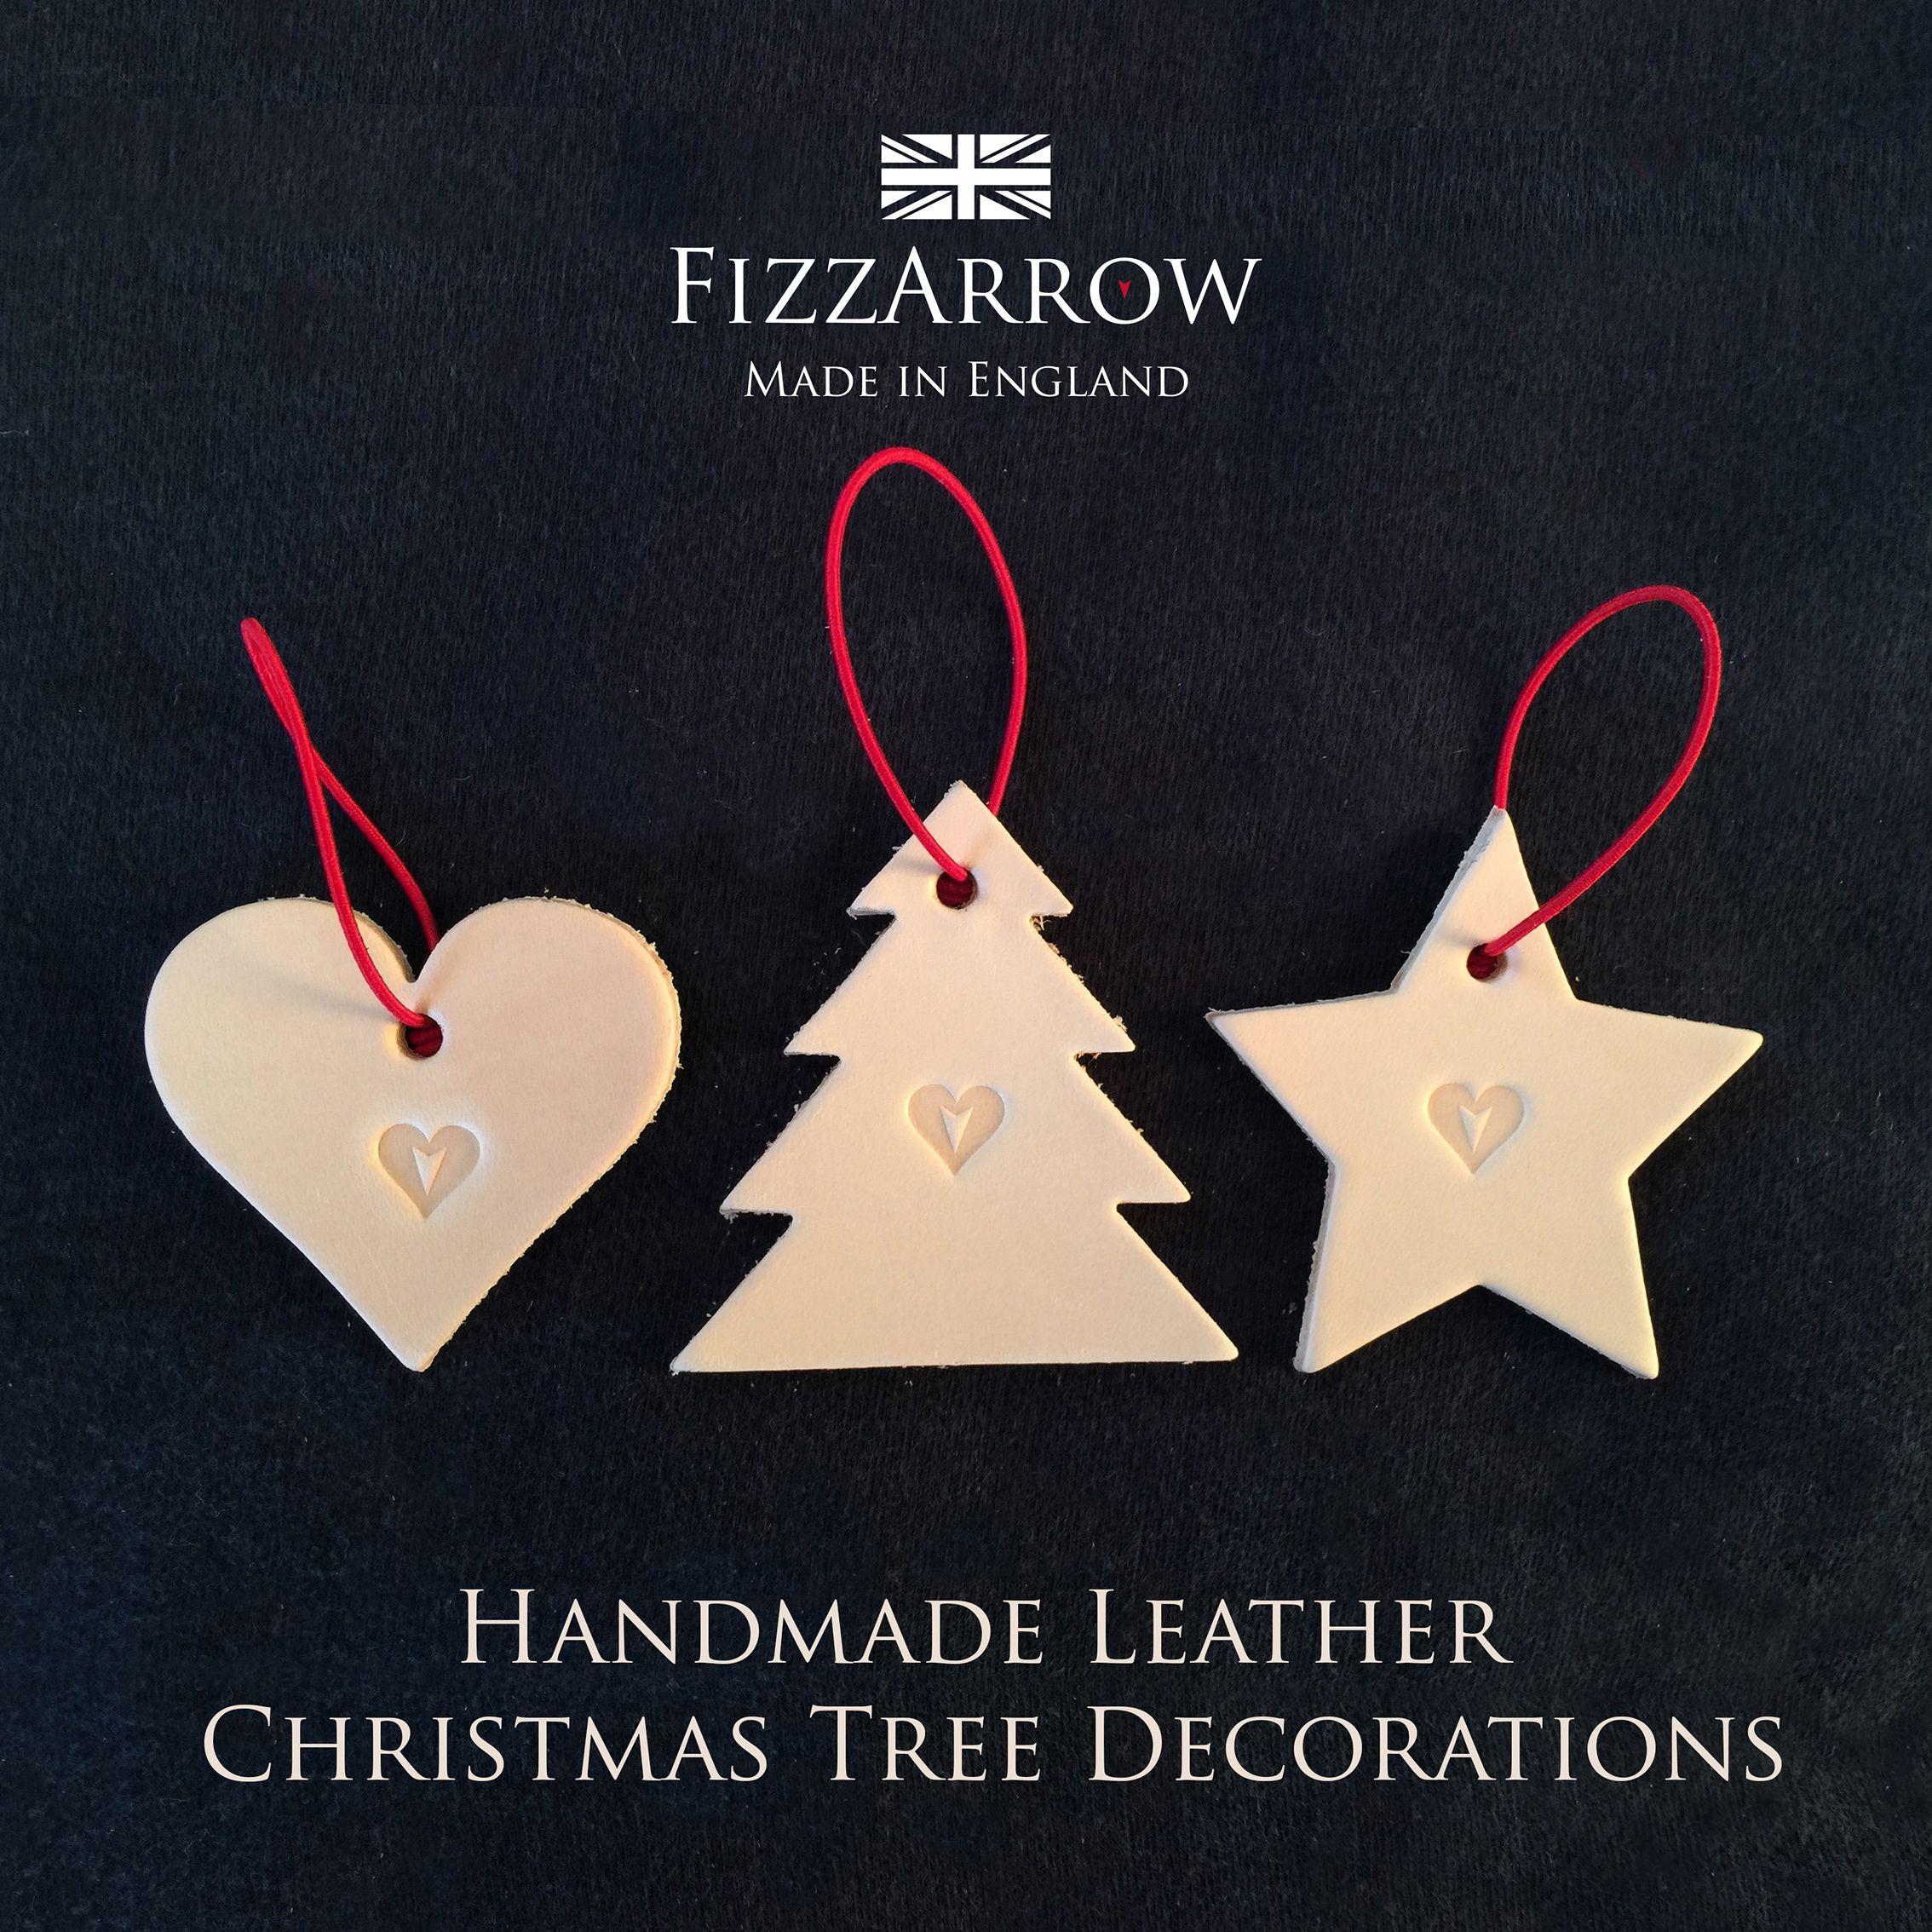 The FizzArrow Barton Leather Christmas Tree Decorations